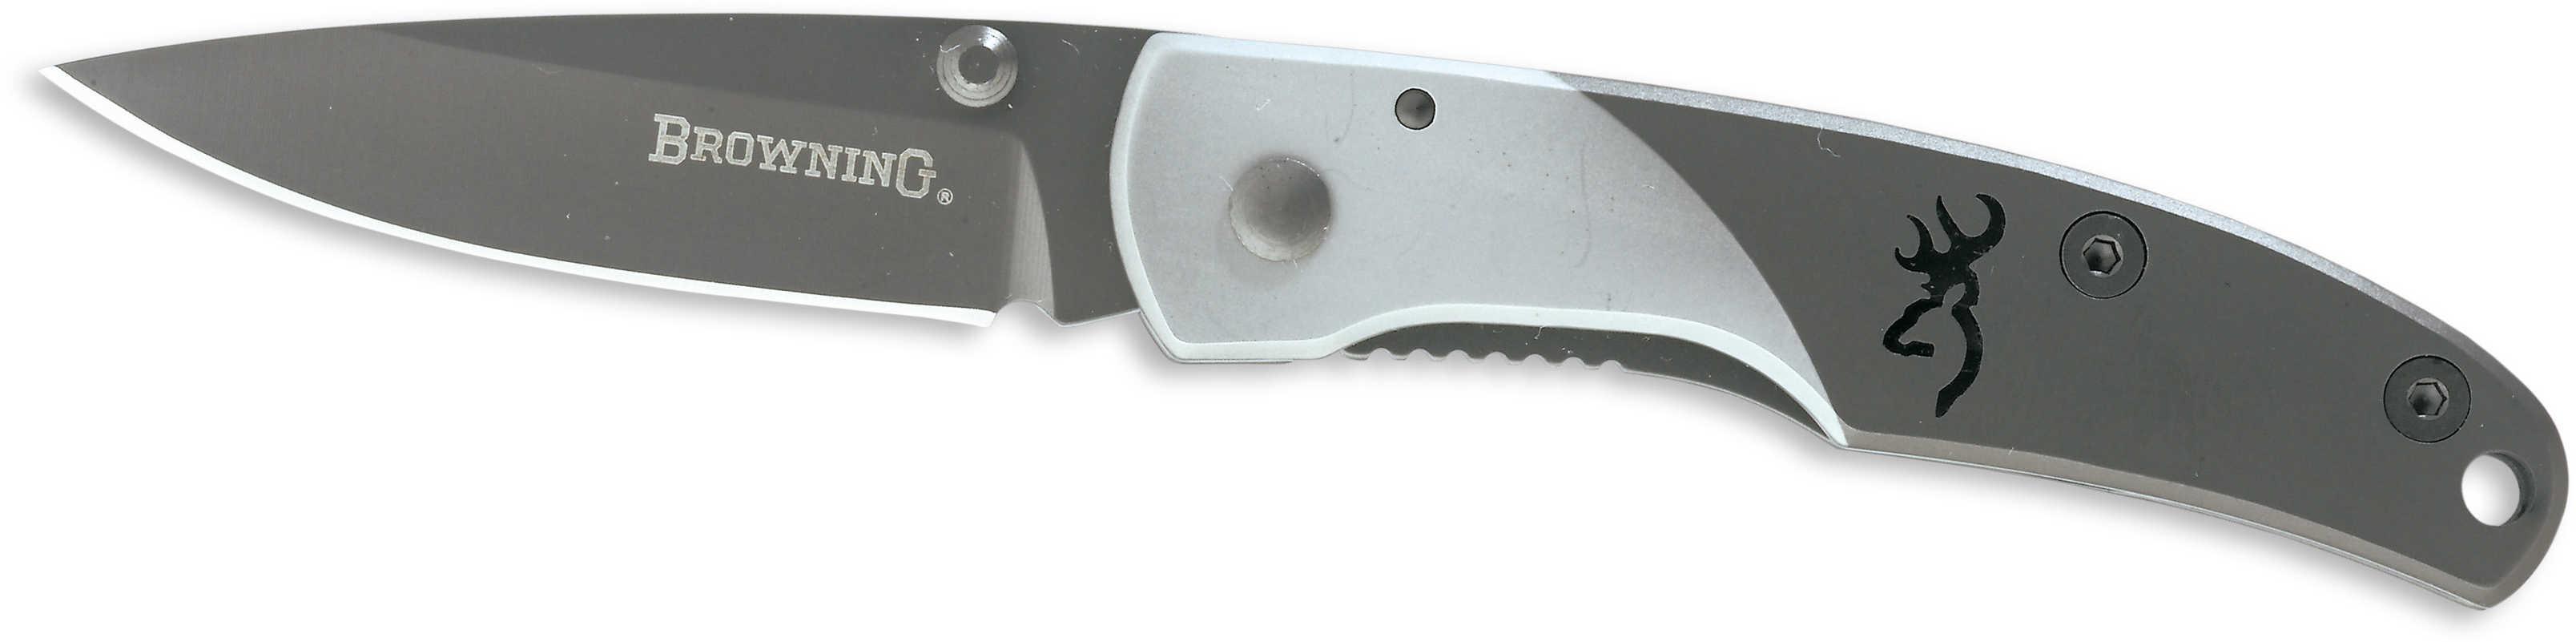 Browning Mountain Ti Folding Knife Small, Gray 322561